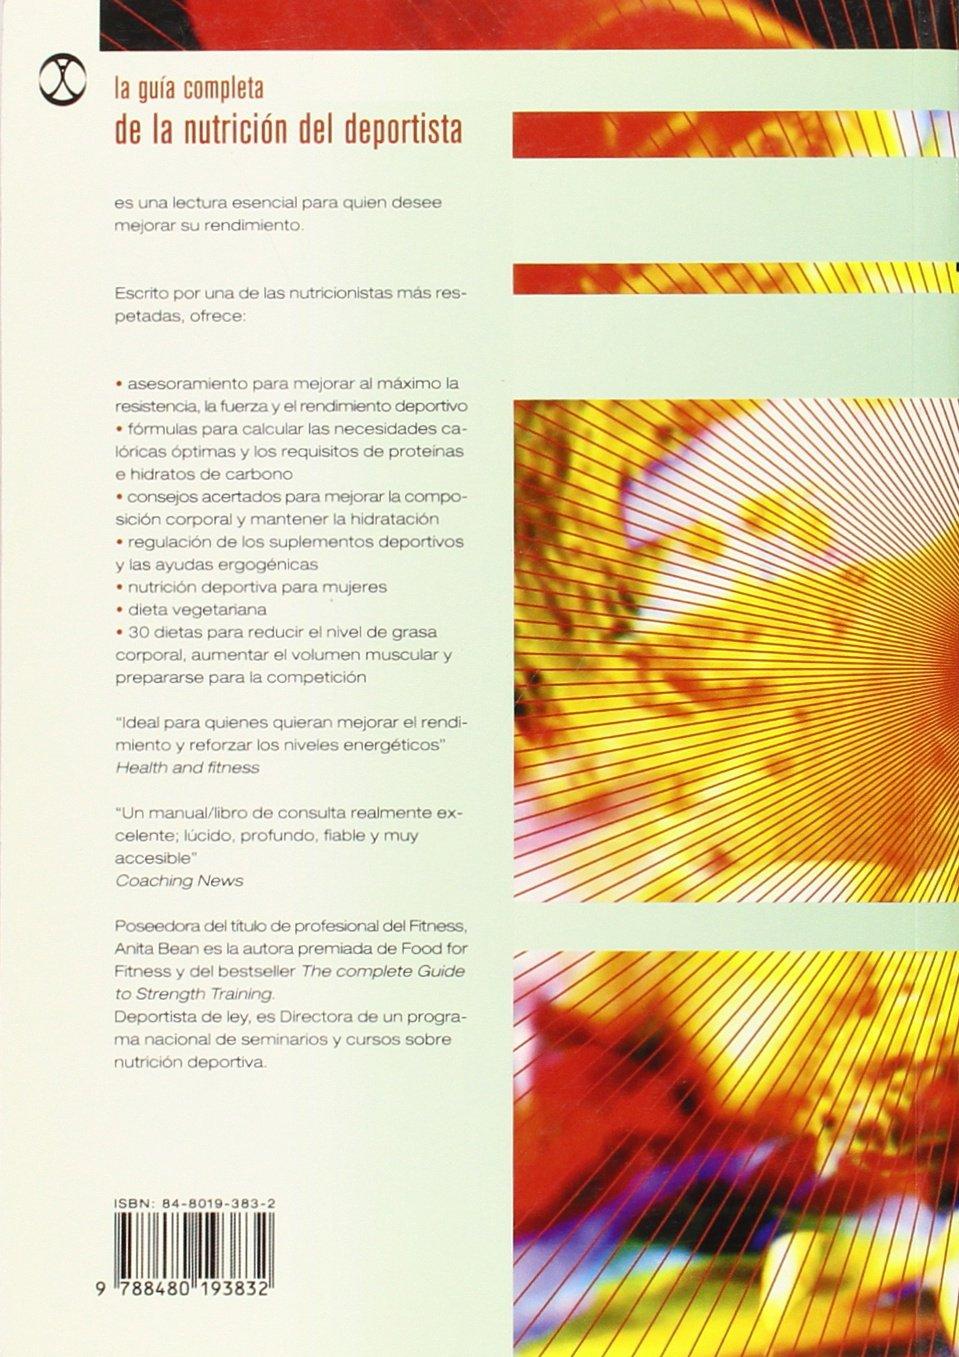 La Guia Completa de La Nutricion del Deportista (Spanish Edition): Anita Bean: 9788480193832: Amazon.com: Books